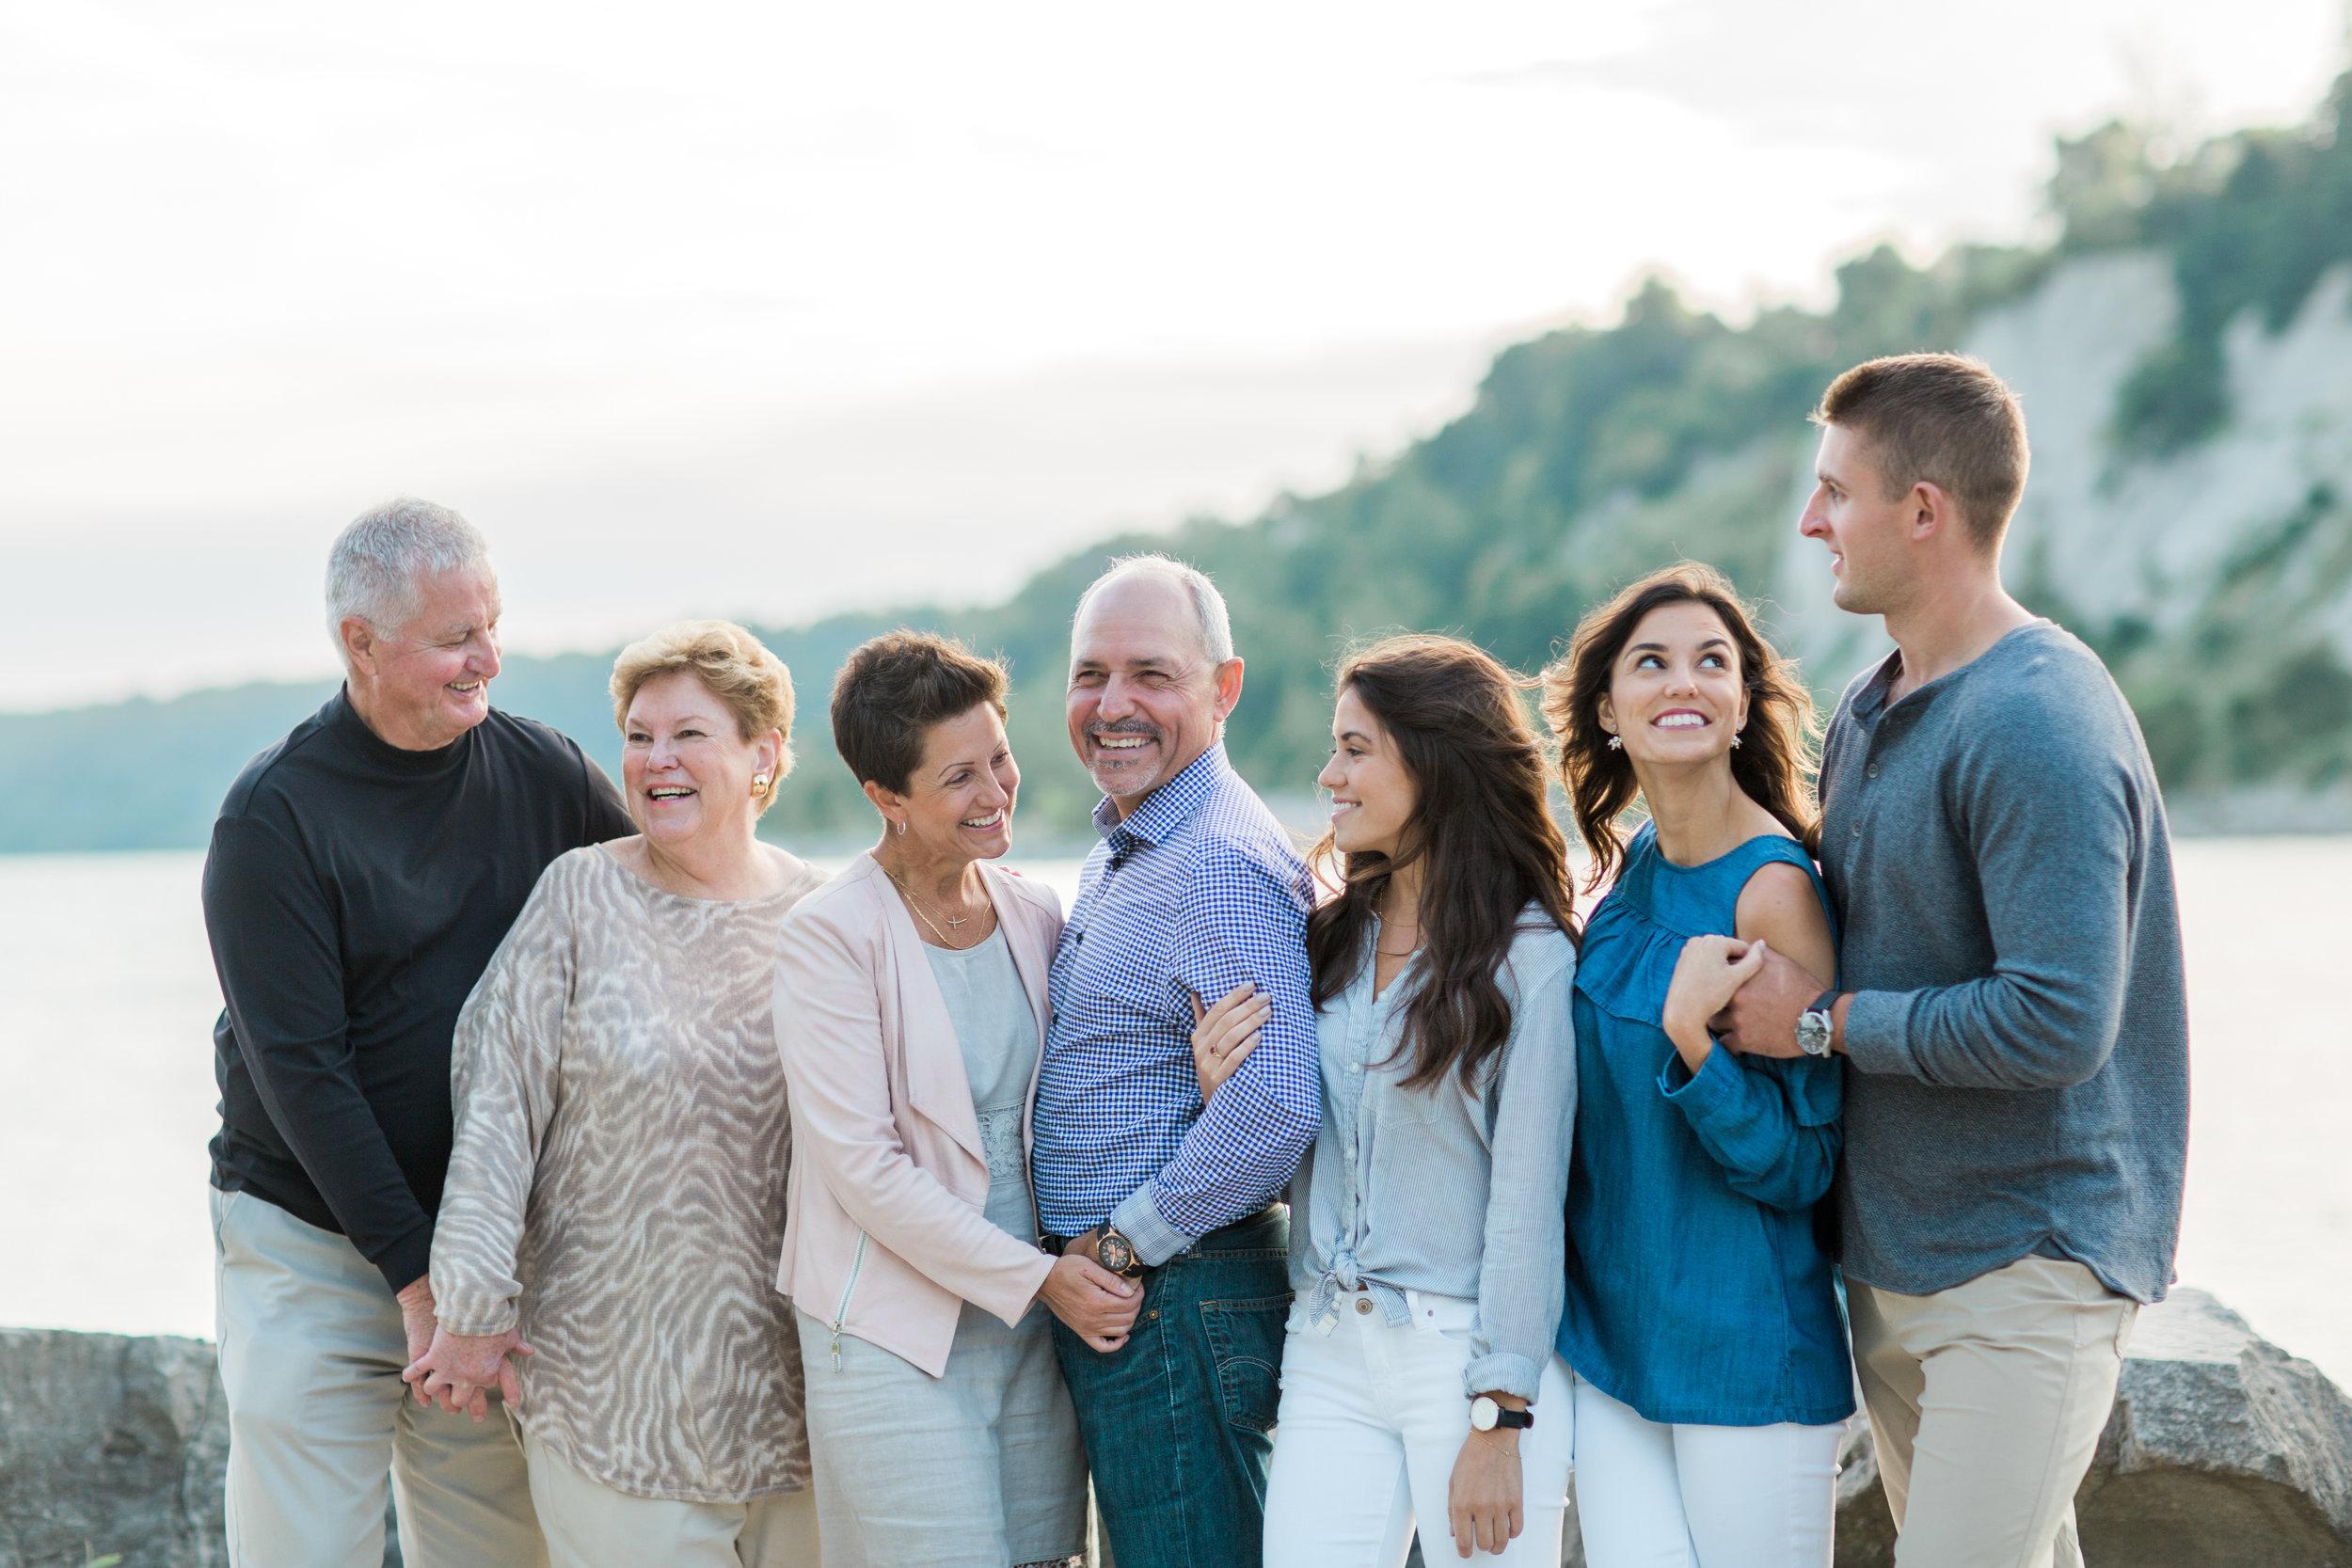 Danielle-Giroux-Amir-Golbazi-Genua-Family-Photography-Scarborough-Bluffs-0227.jpg